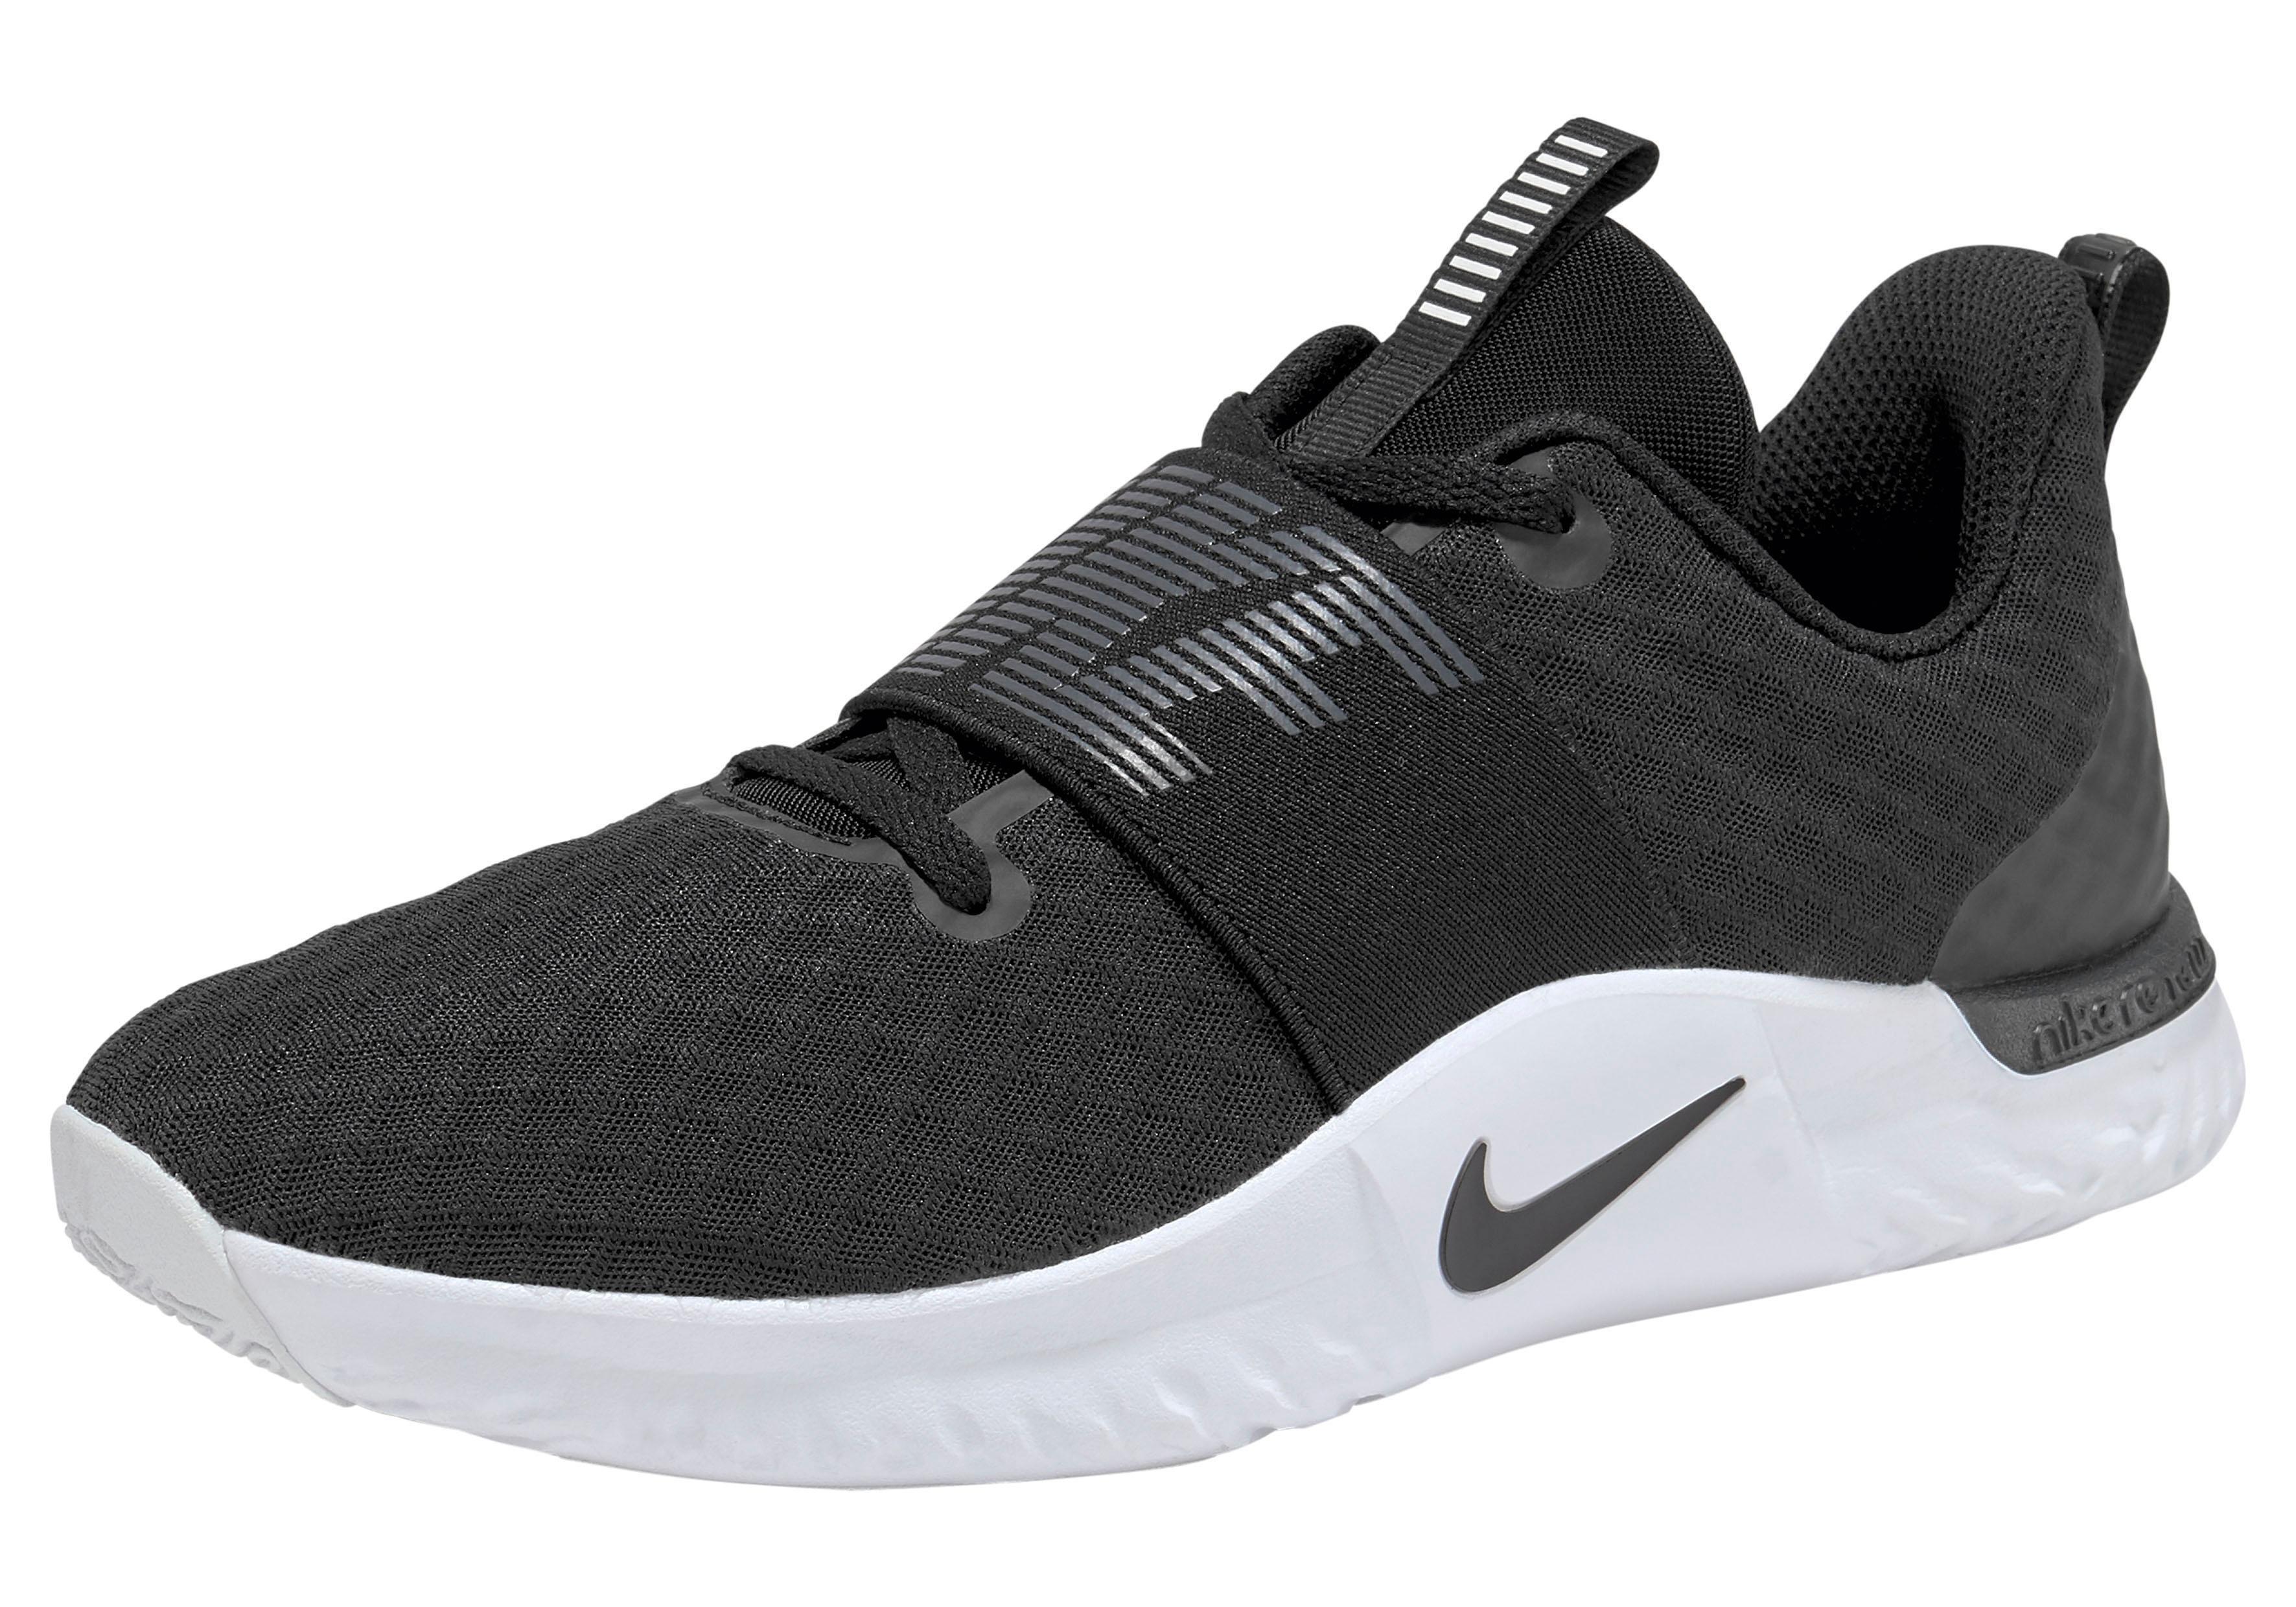 Nike fitnessschoenen »Wmns Renew In-season Tr 9« - gratis ruilen op otto.nl